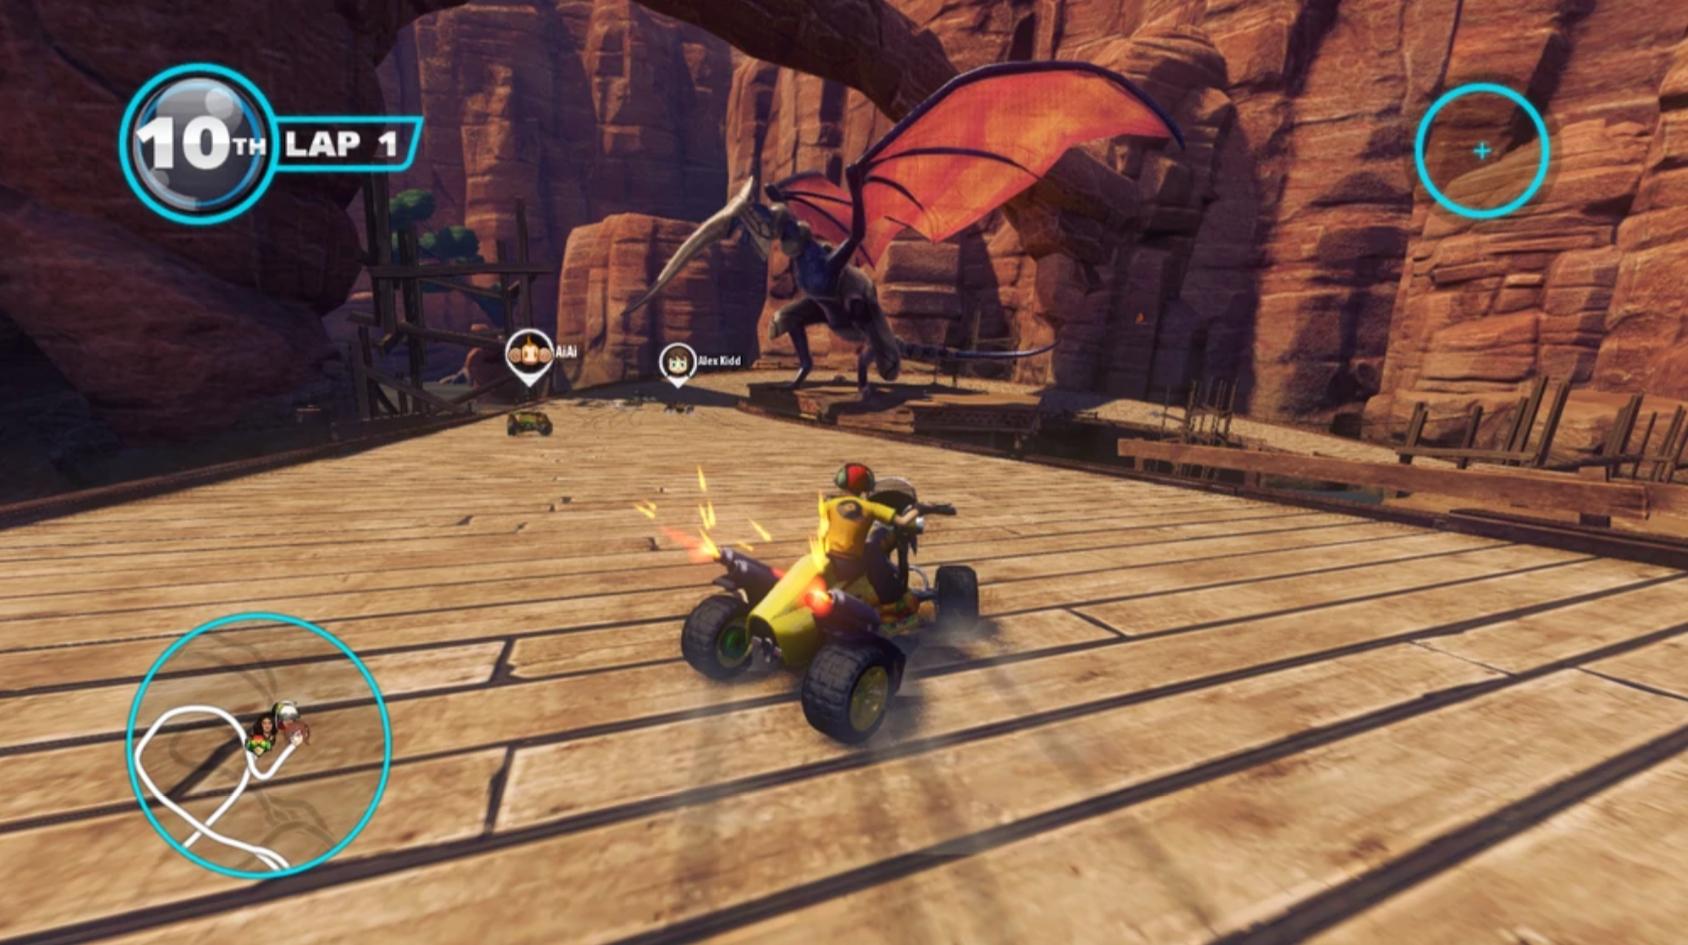 Sonic & All-Stars Racing Transformed (2012)